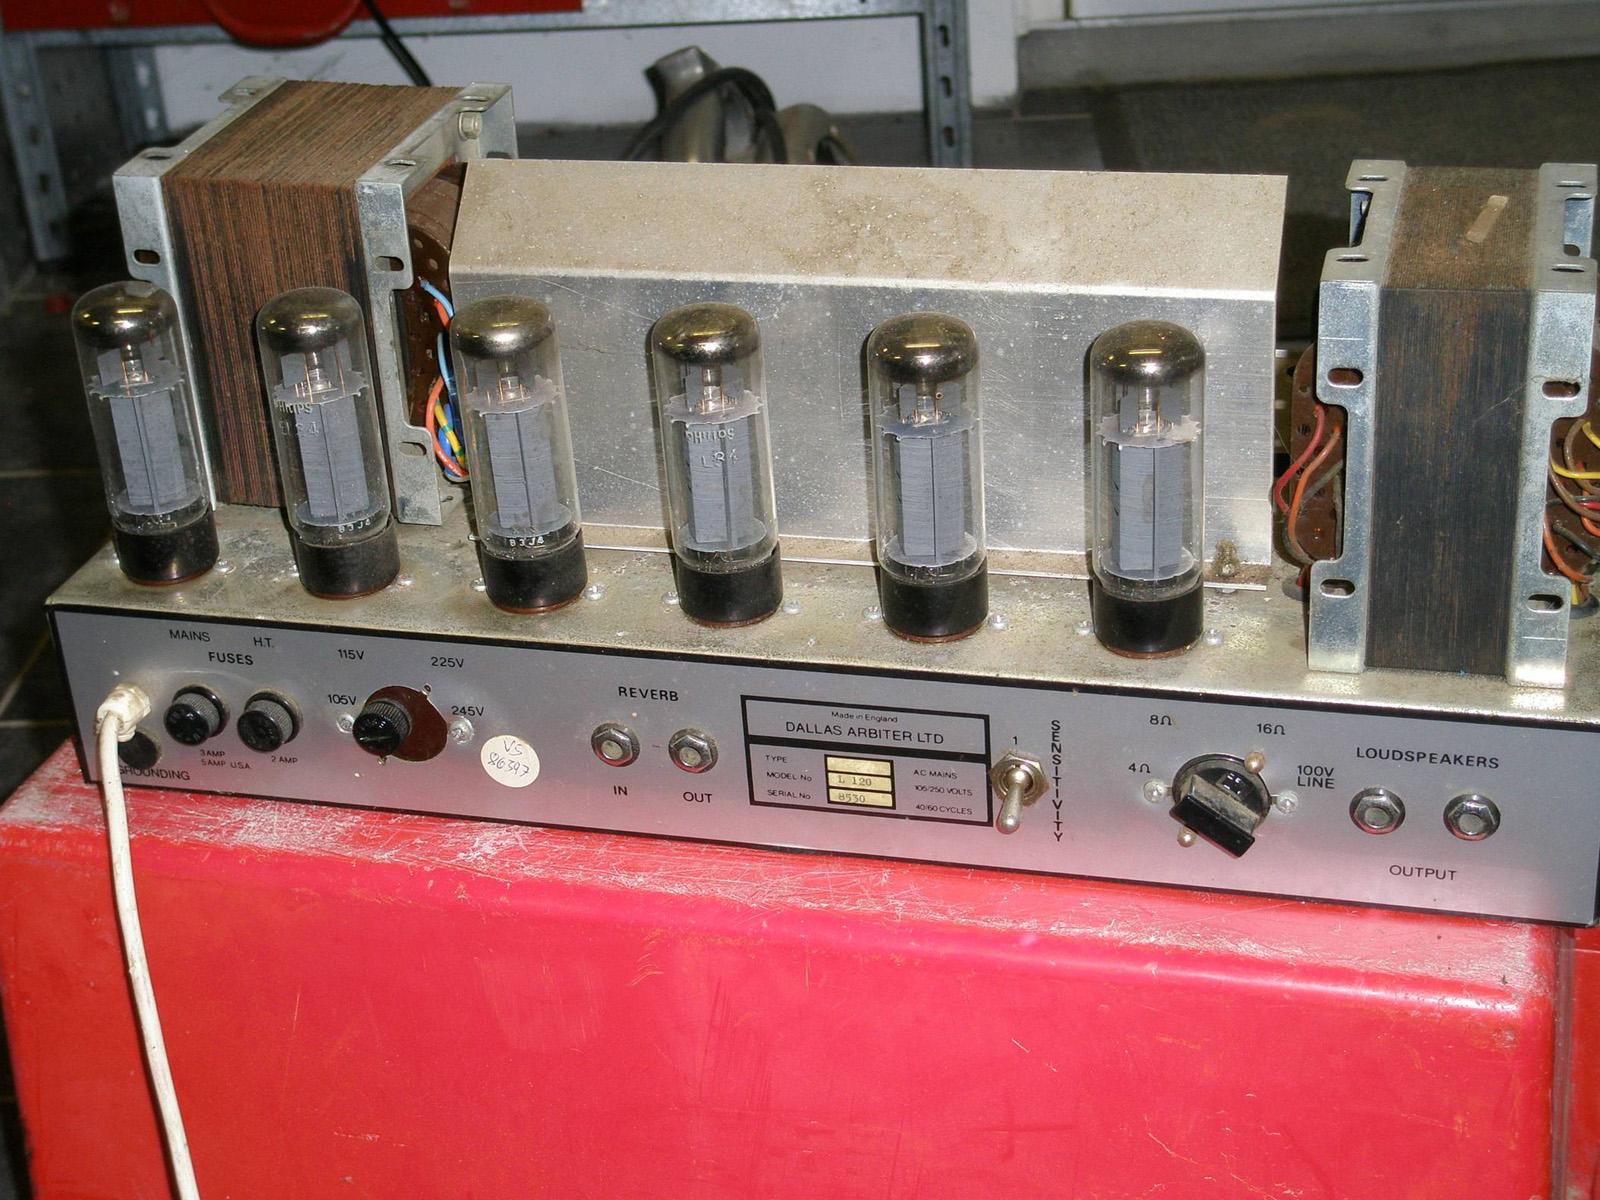 2x30w El34 Tube Amplifier Kaizer Power Electronics Wave Rectifier Circuit For Amp Tubeamplifier Audiocircuit Image009